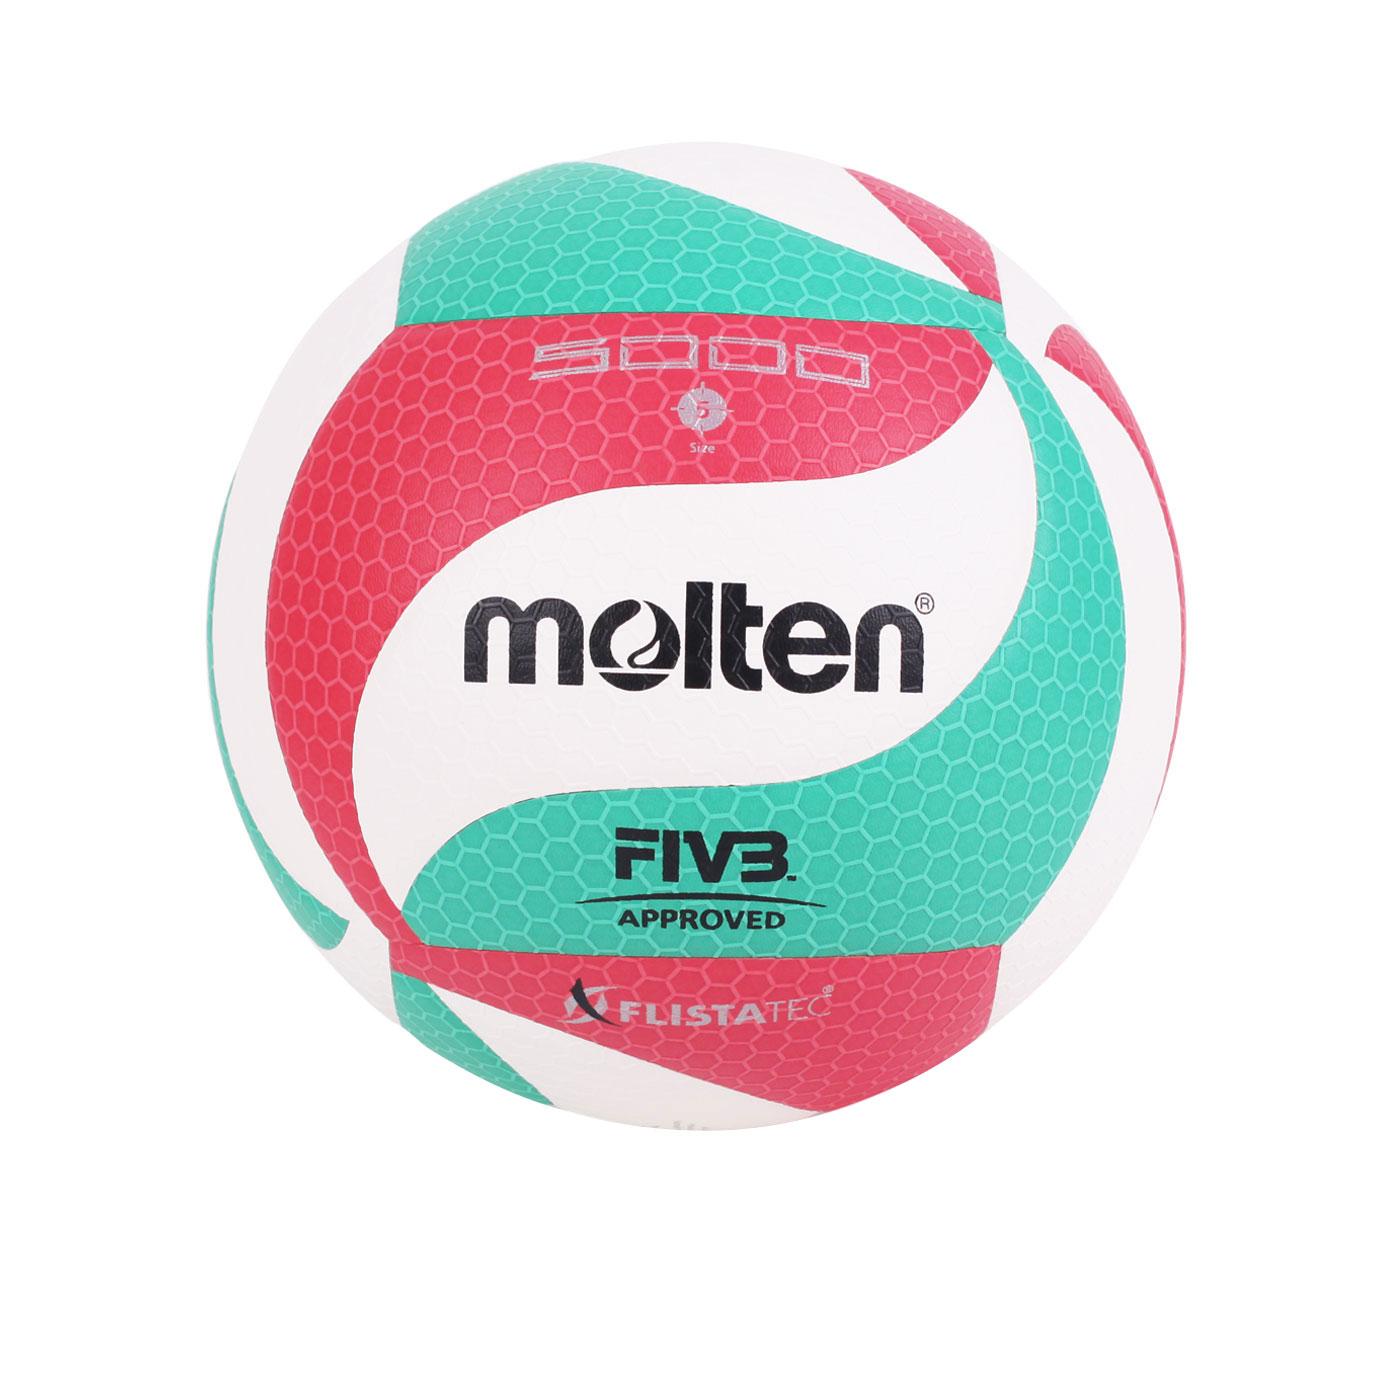 Molten #5合成皮排球 V5M5000 - 白紅綠